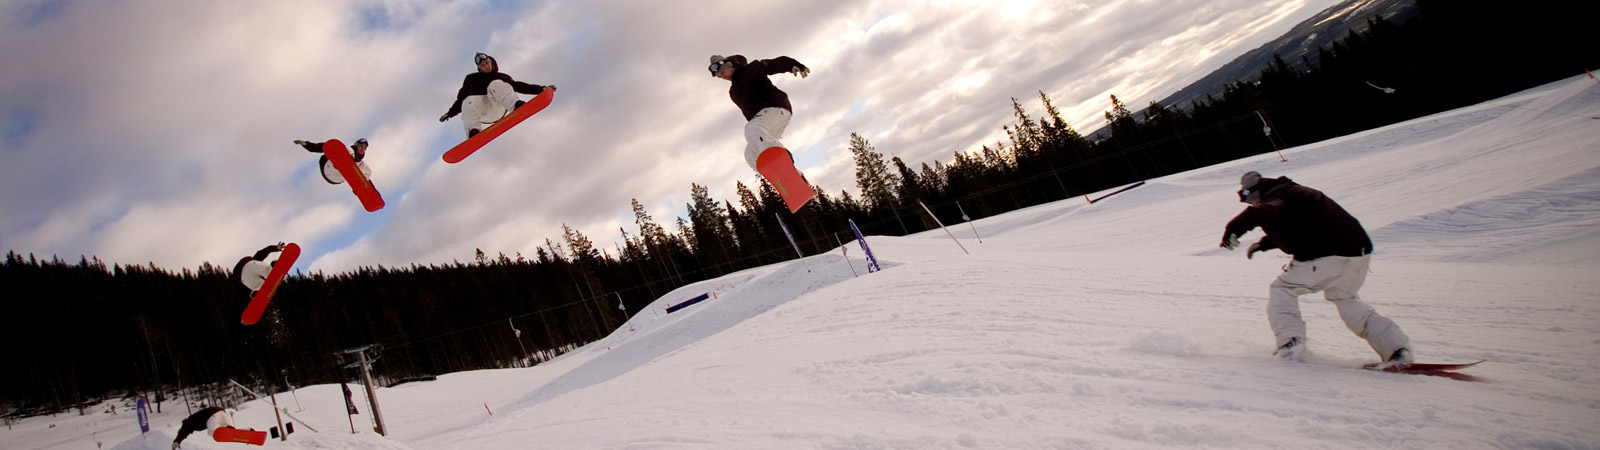 Snowboarding Terrain Park Design